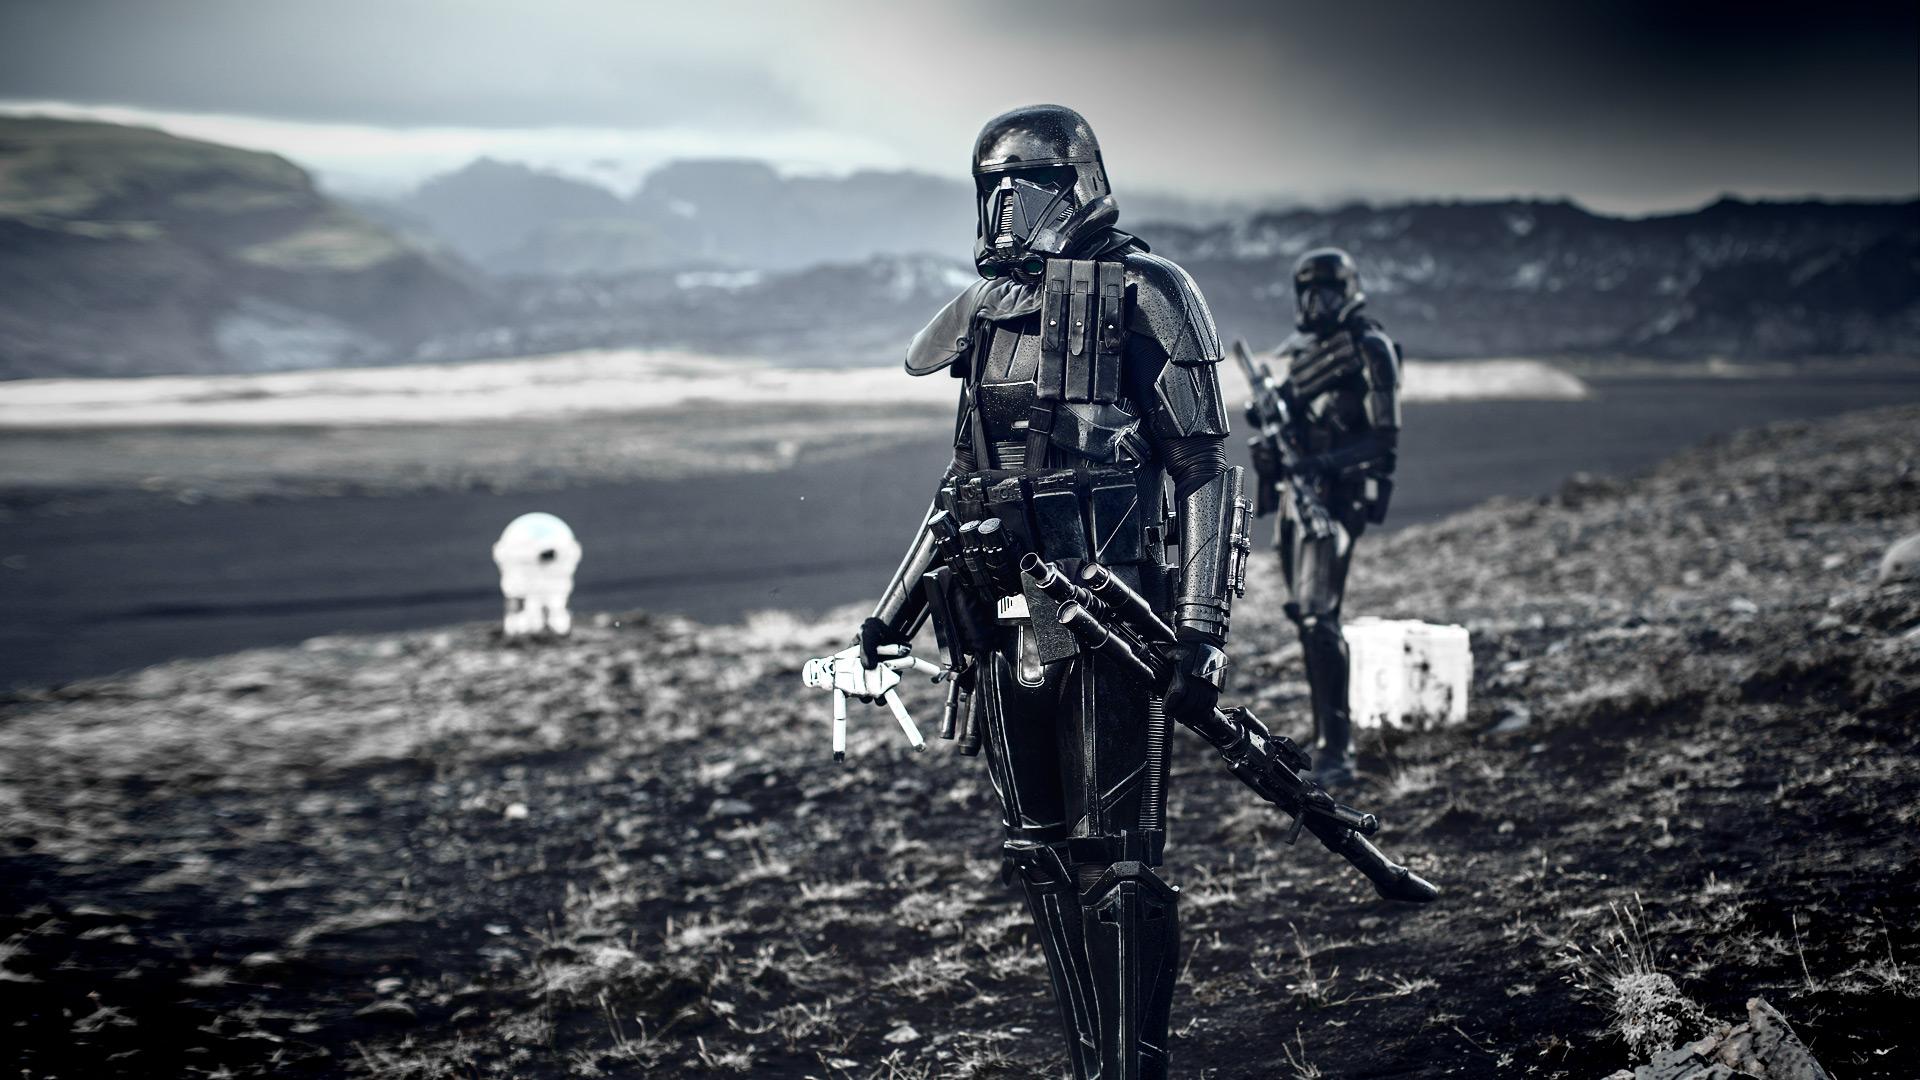 Wallpaper 1920x1080 Px Imperial Death Trooper Rogue One A Star Wars Story Star Wars Stormtrooper 1920x1080 4kwallpaper 1470593 Hd Wallpapers Wallhere